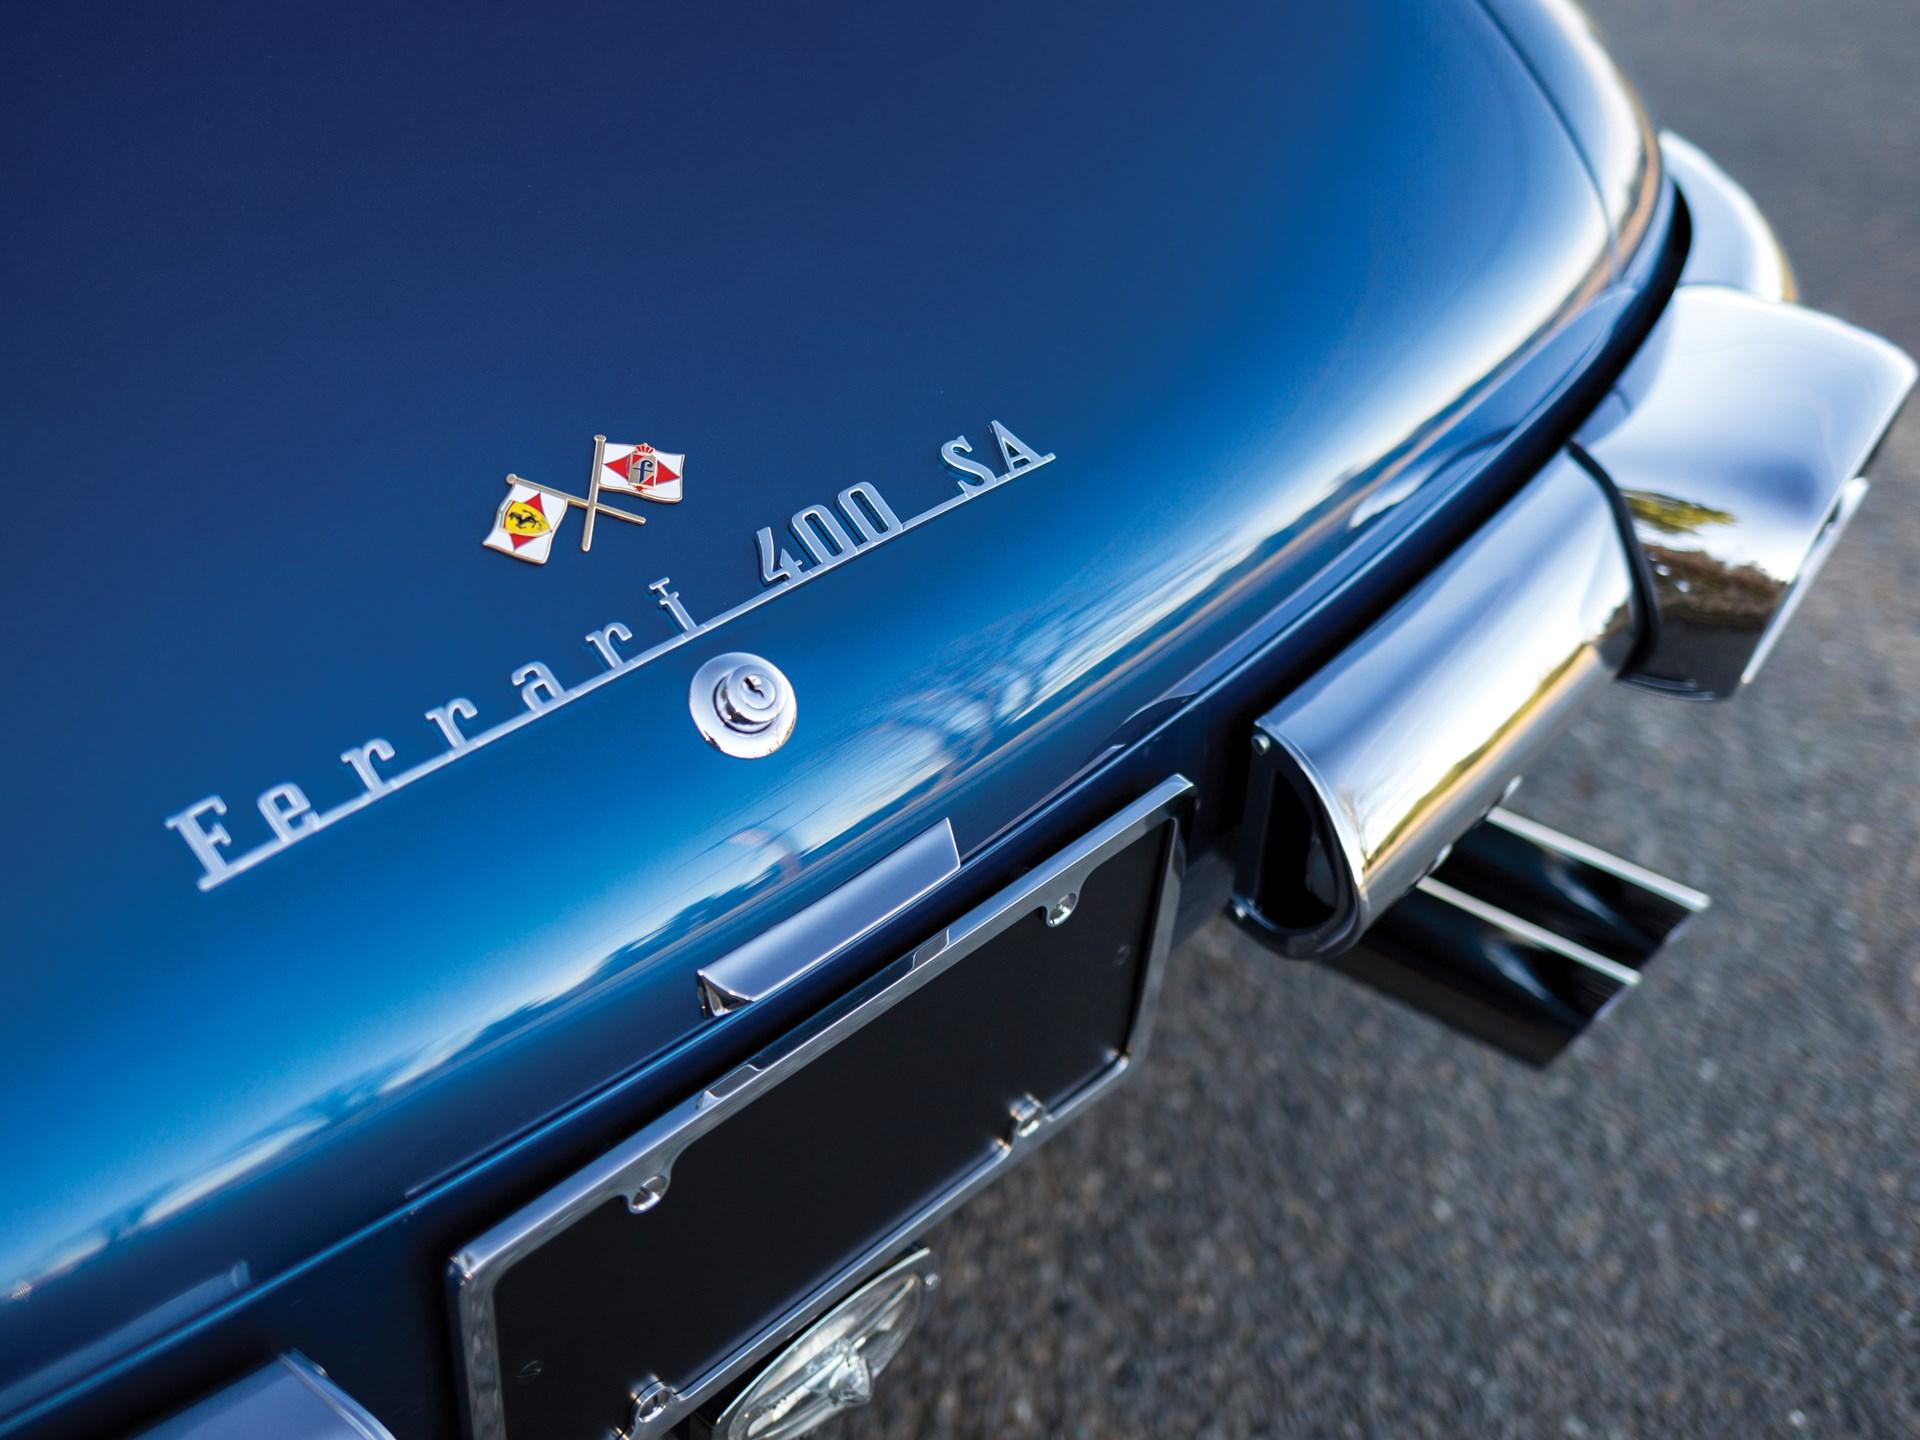 1962 Ferrari 400 Superamerica LWB Coupe Aerodinamico by Pininfarina